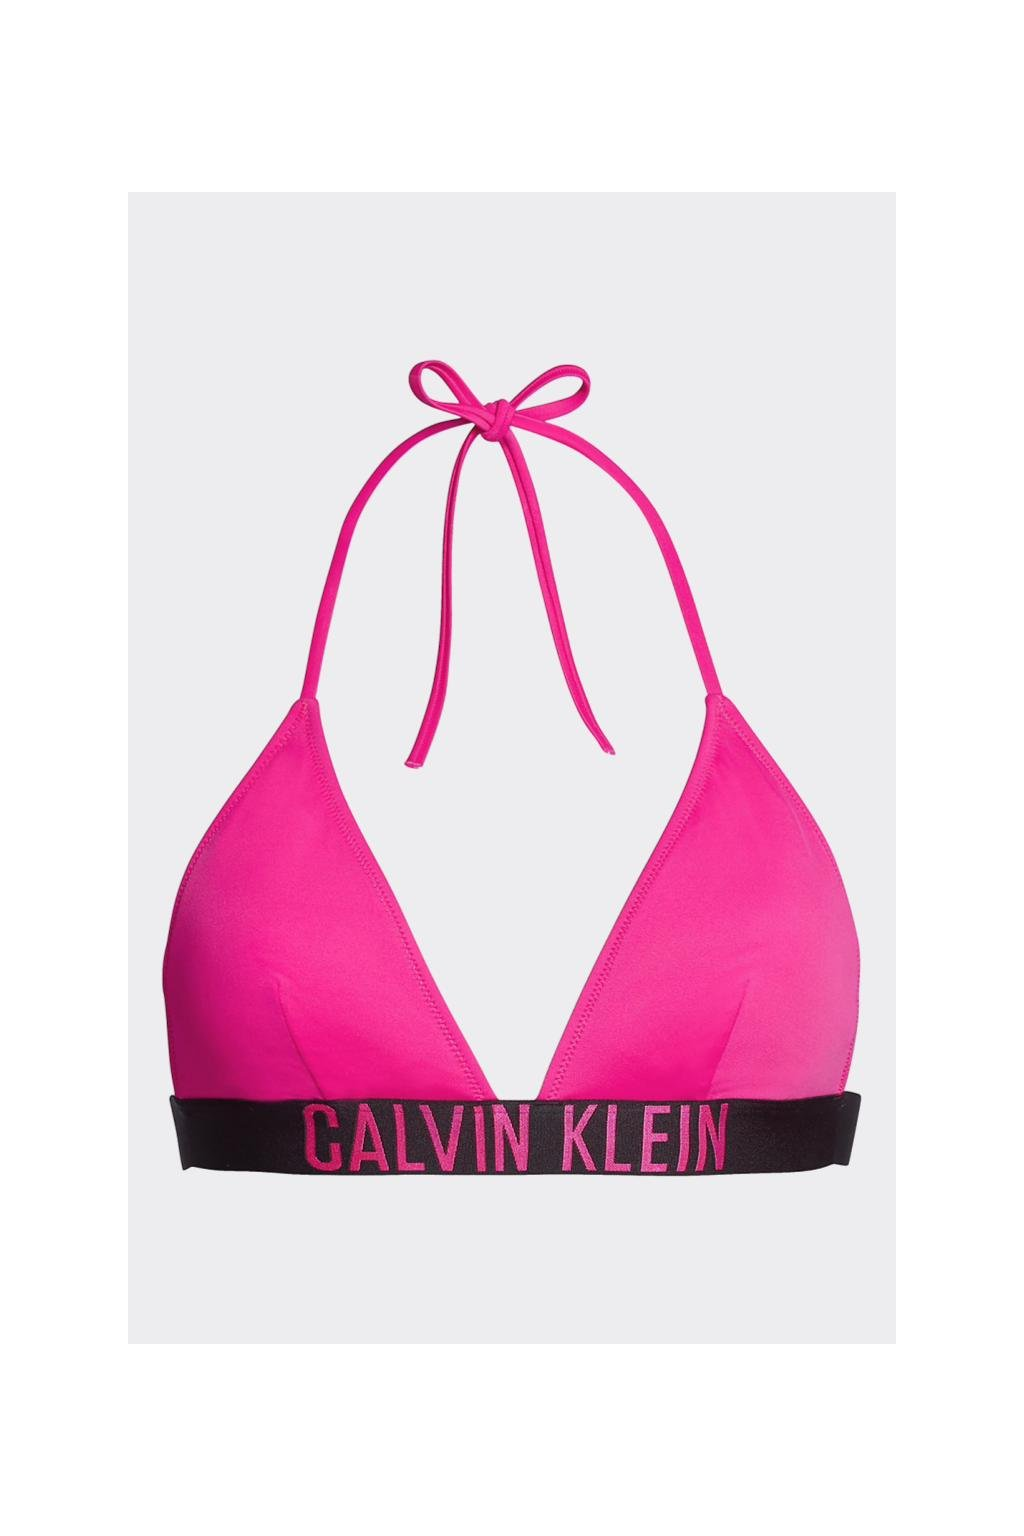 Calvin Klein Intense Power Triangle vrchní díl plavek - růžová